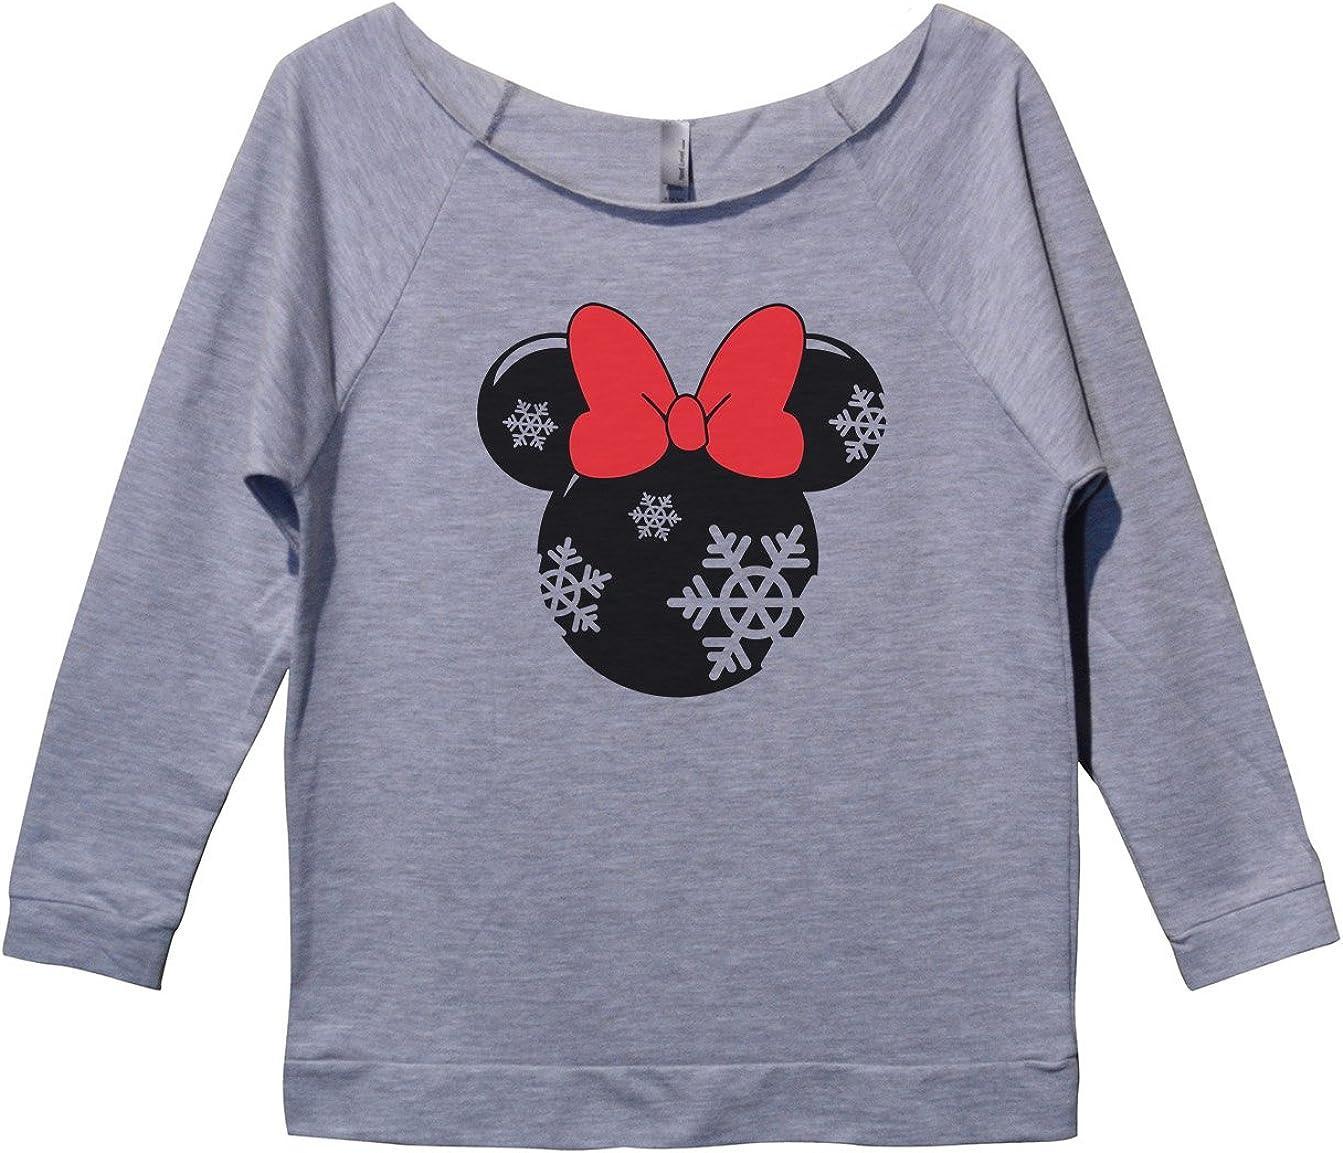 "Womens 3/4 Sleeve ""Minnie Mouse"" Holiday Disney Christmas Sweatshirt"